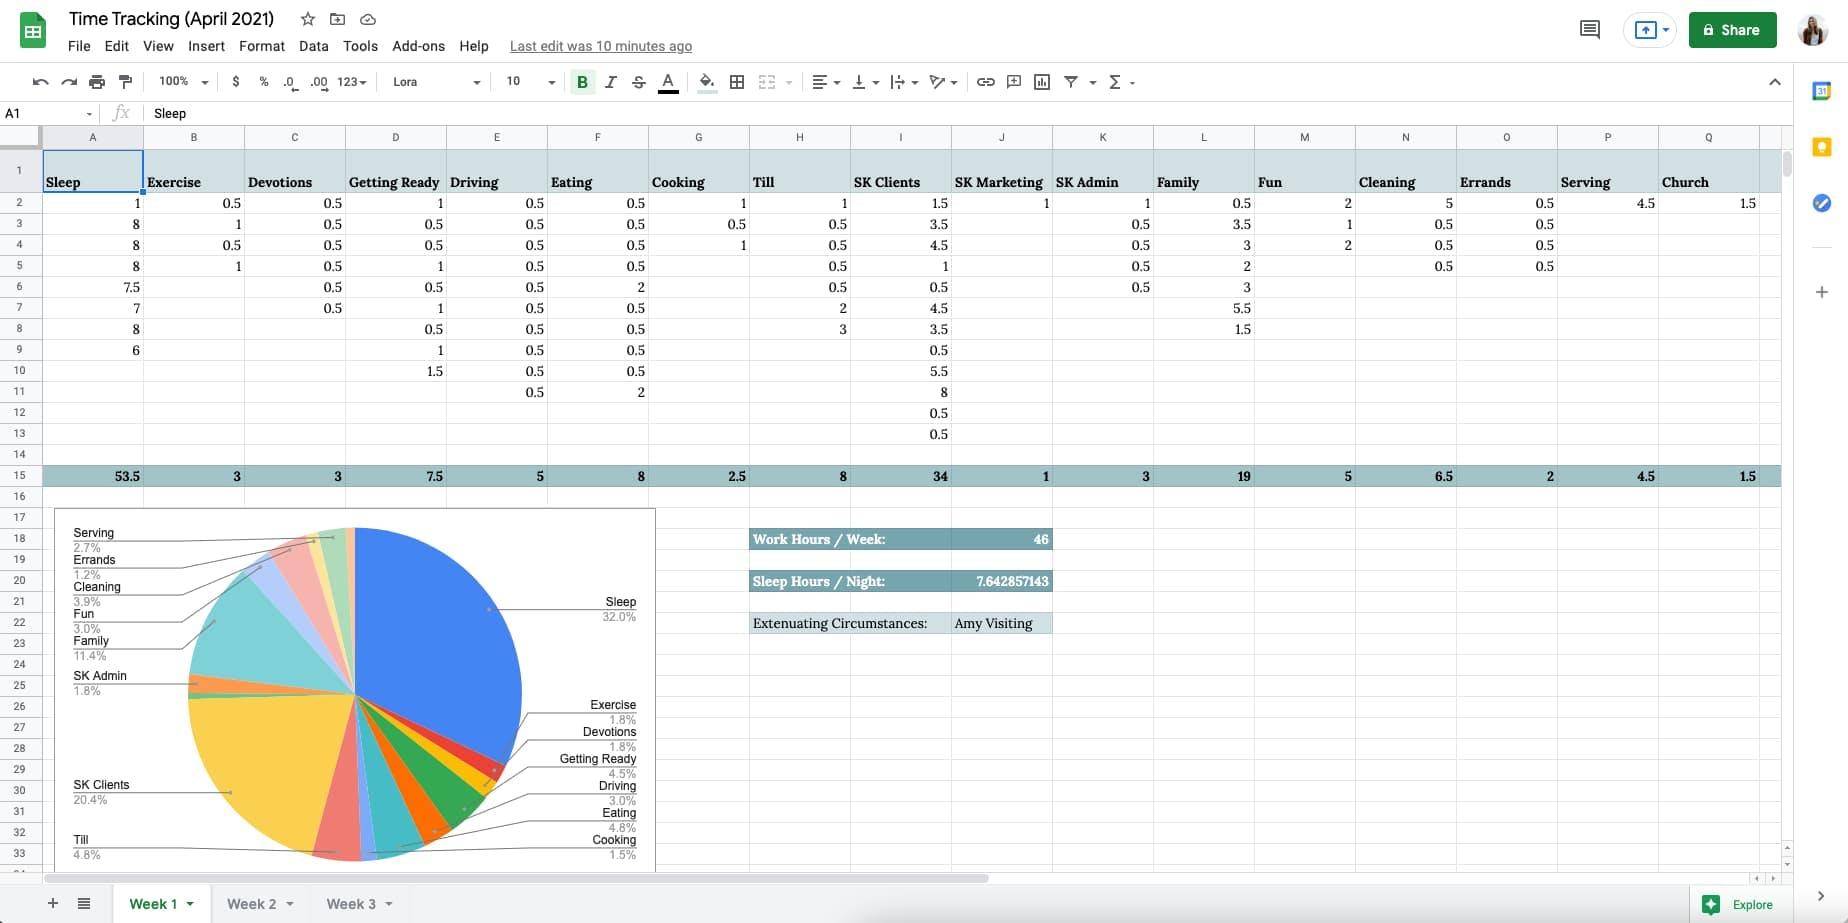 Sarah Klongerbo's time tracking spreadsheet